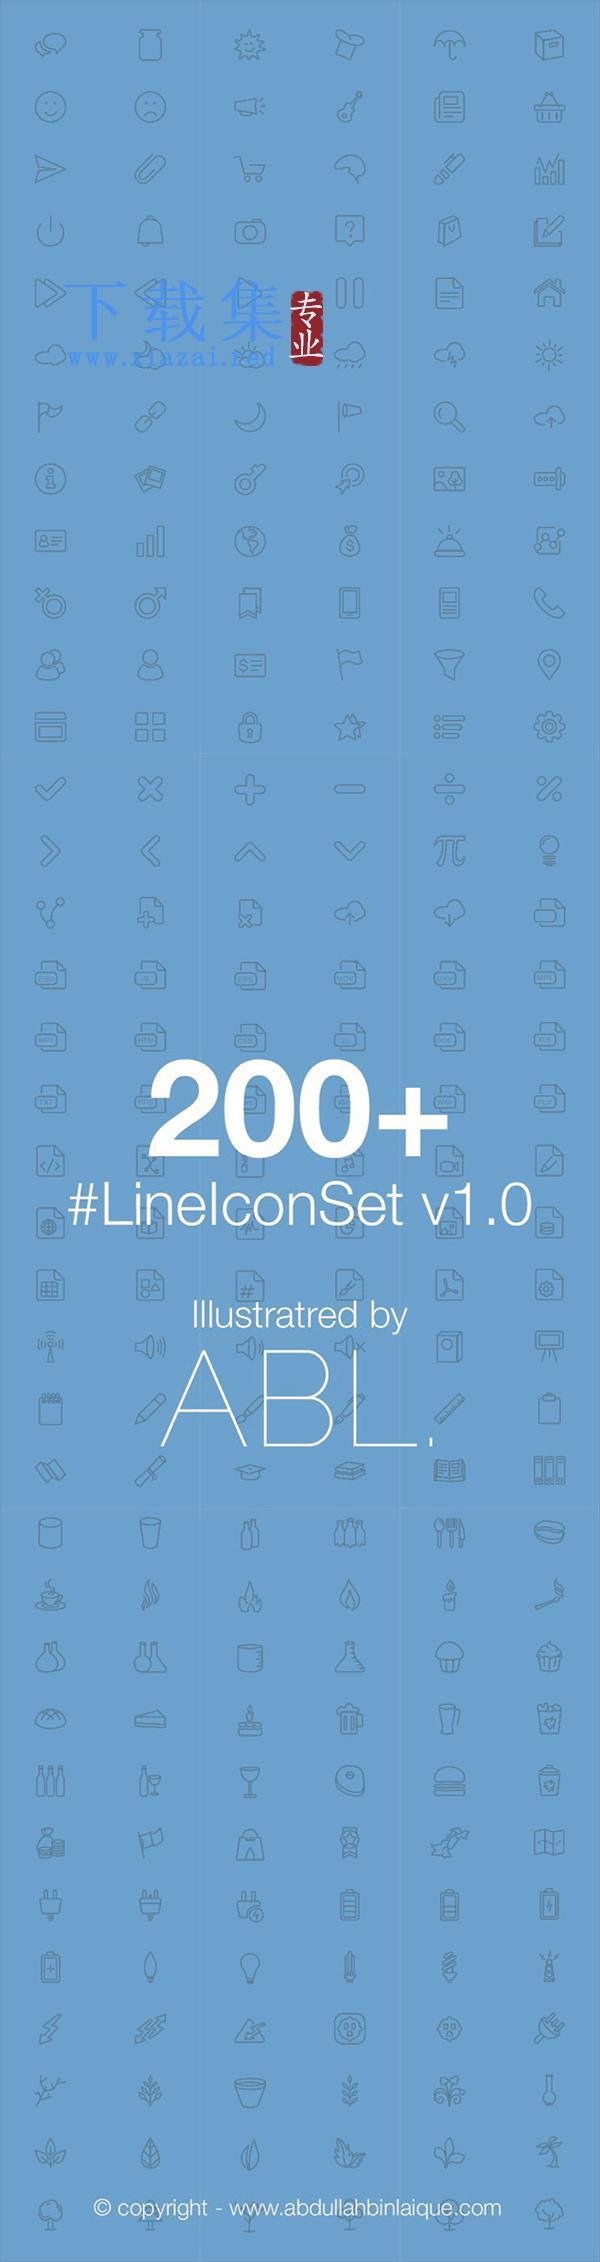 200+LineIconSetv1.0EPS矢量图标  第2张